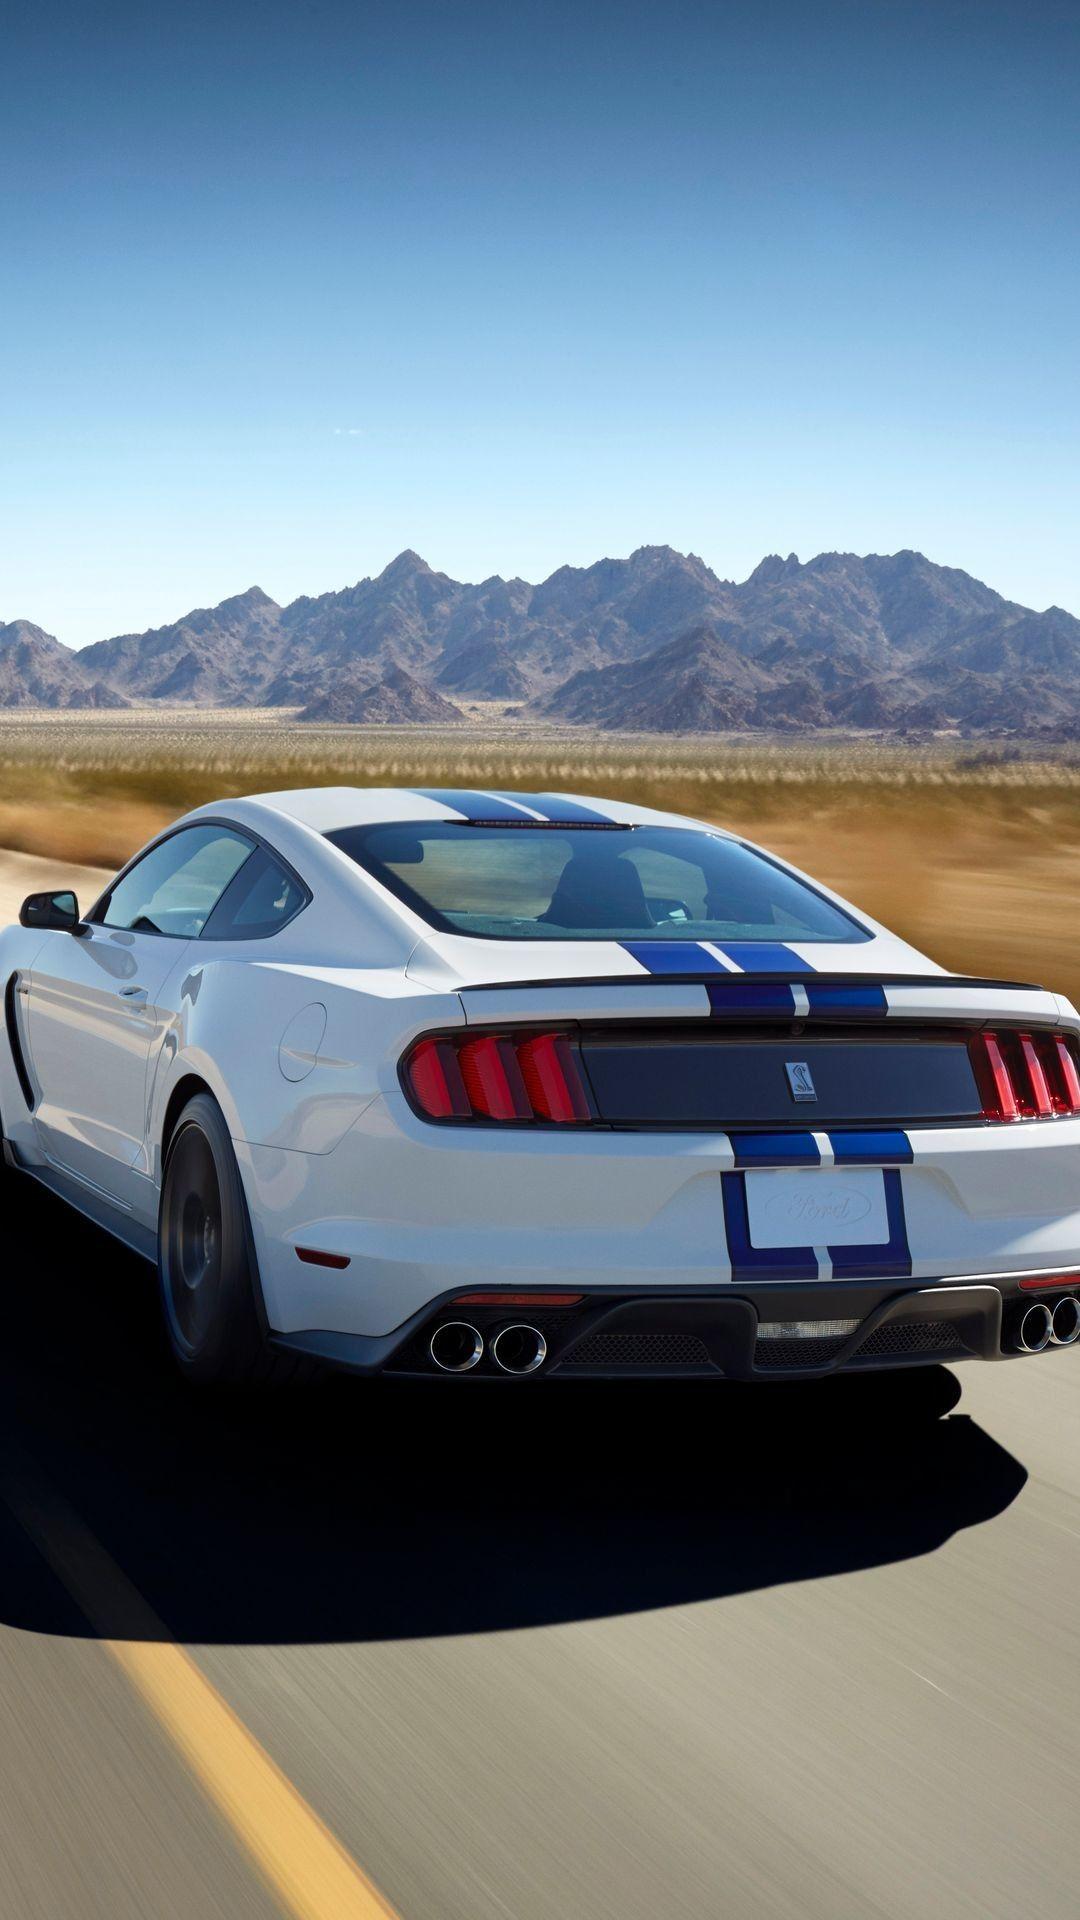 Full Hd Mustang Iphone Wallpaper ipcwallpapers in 2020 Mustang 1080x1920